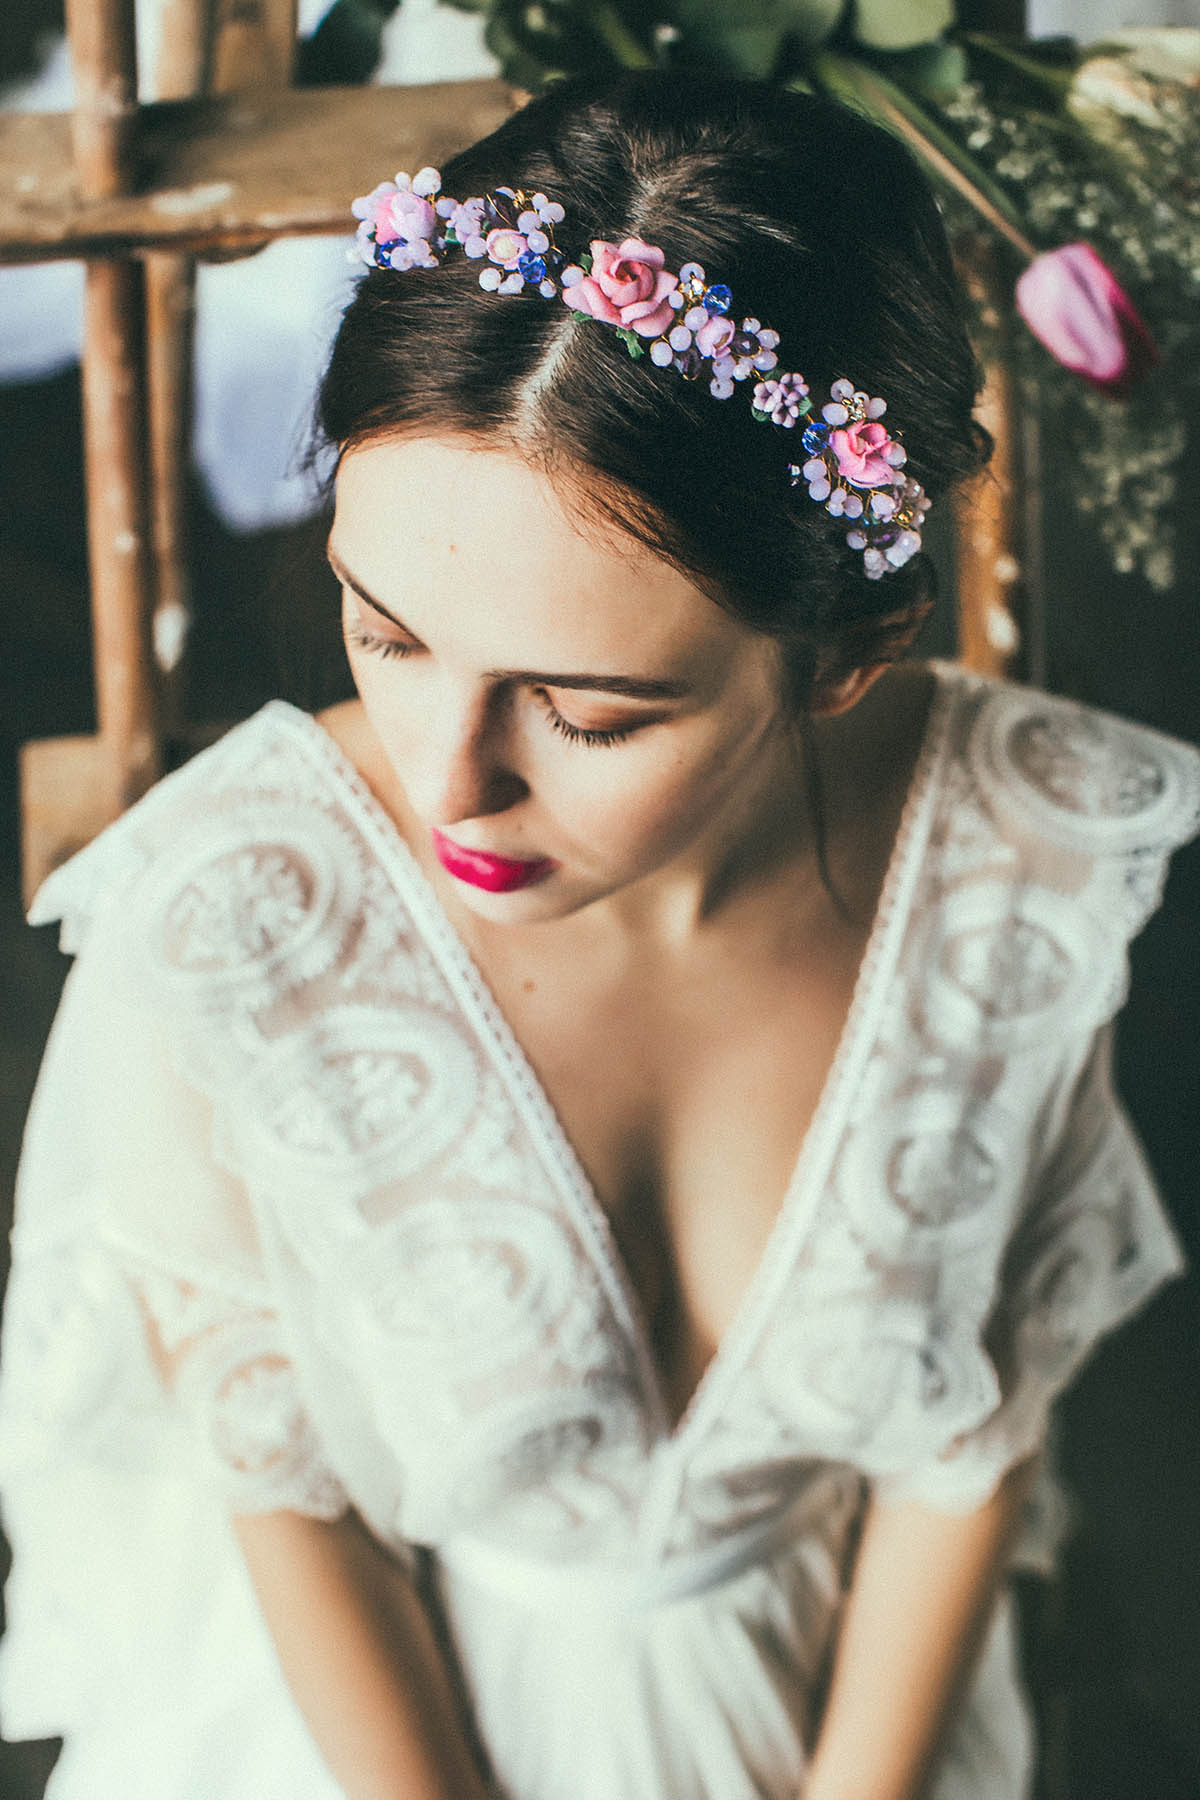 We-Are-Flowergirls_Lookbook_Flowercrown_Blumenkranz_SS17_c_Lupi-Spuma_Web_24.jpg